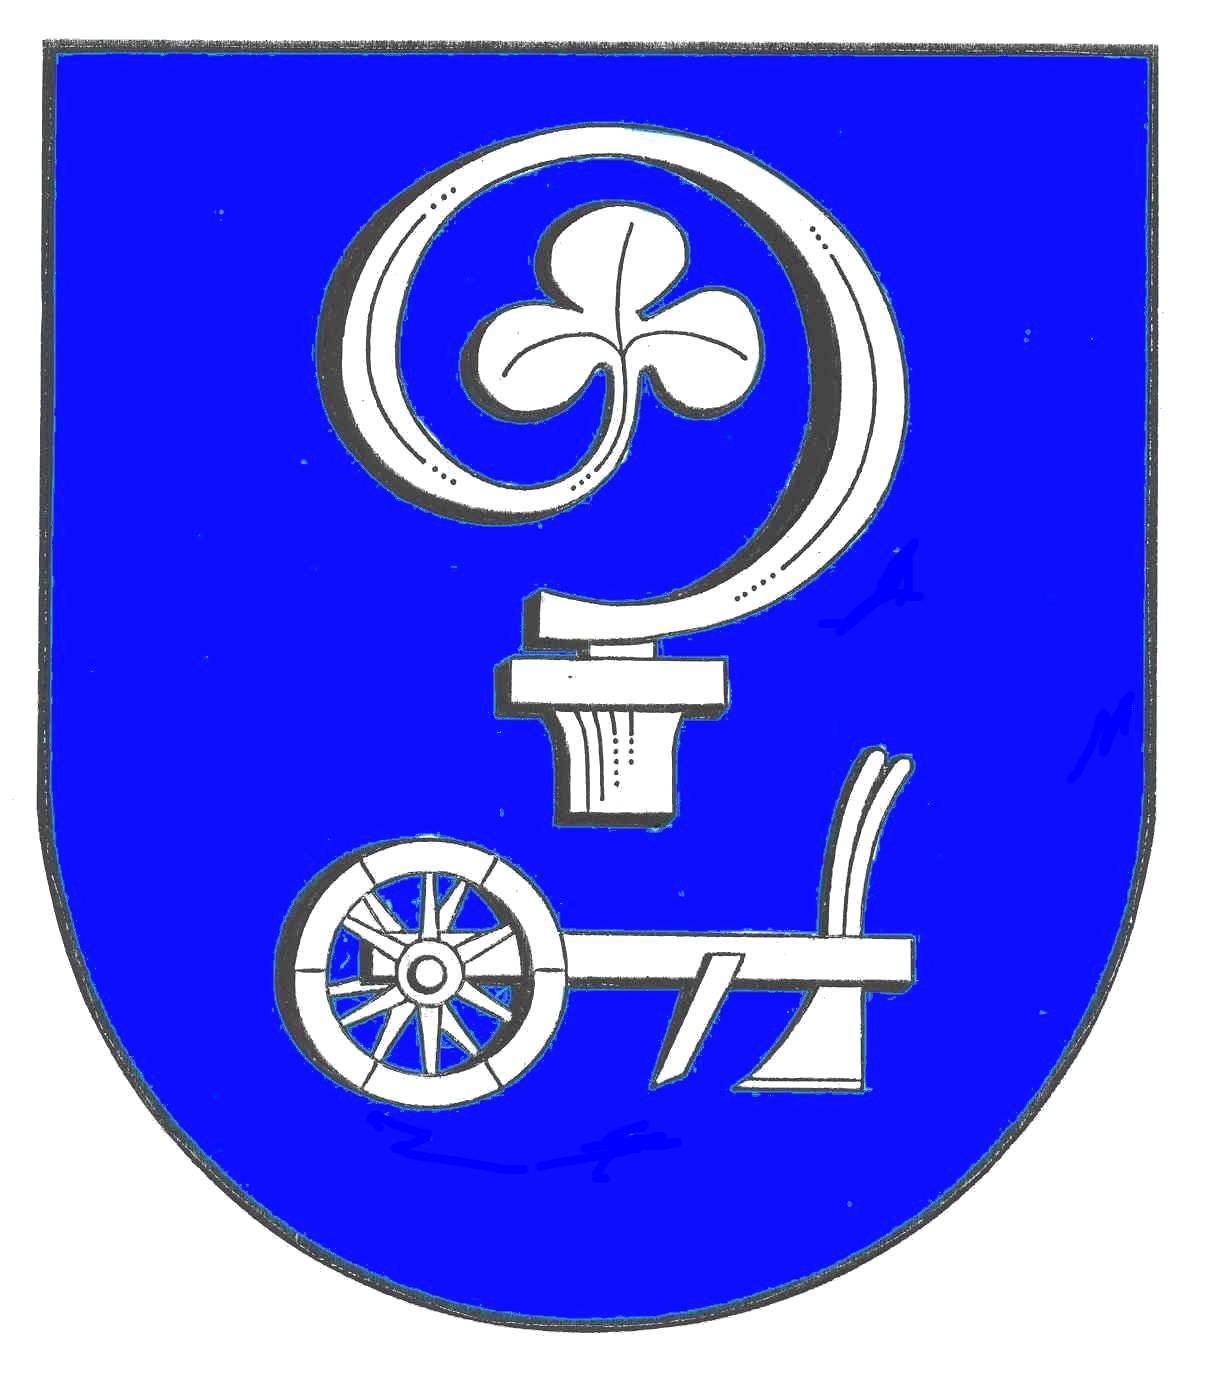 Wappen GemeindeFuhlendorf, Kreis Segeberg